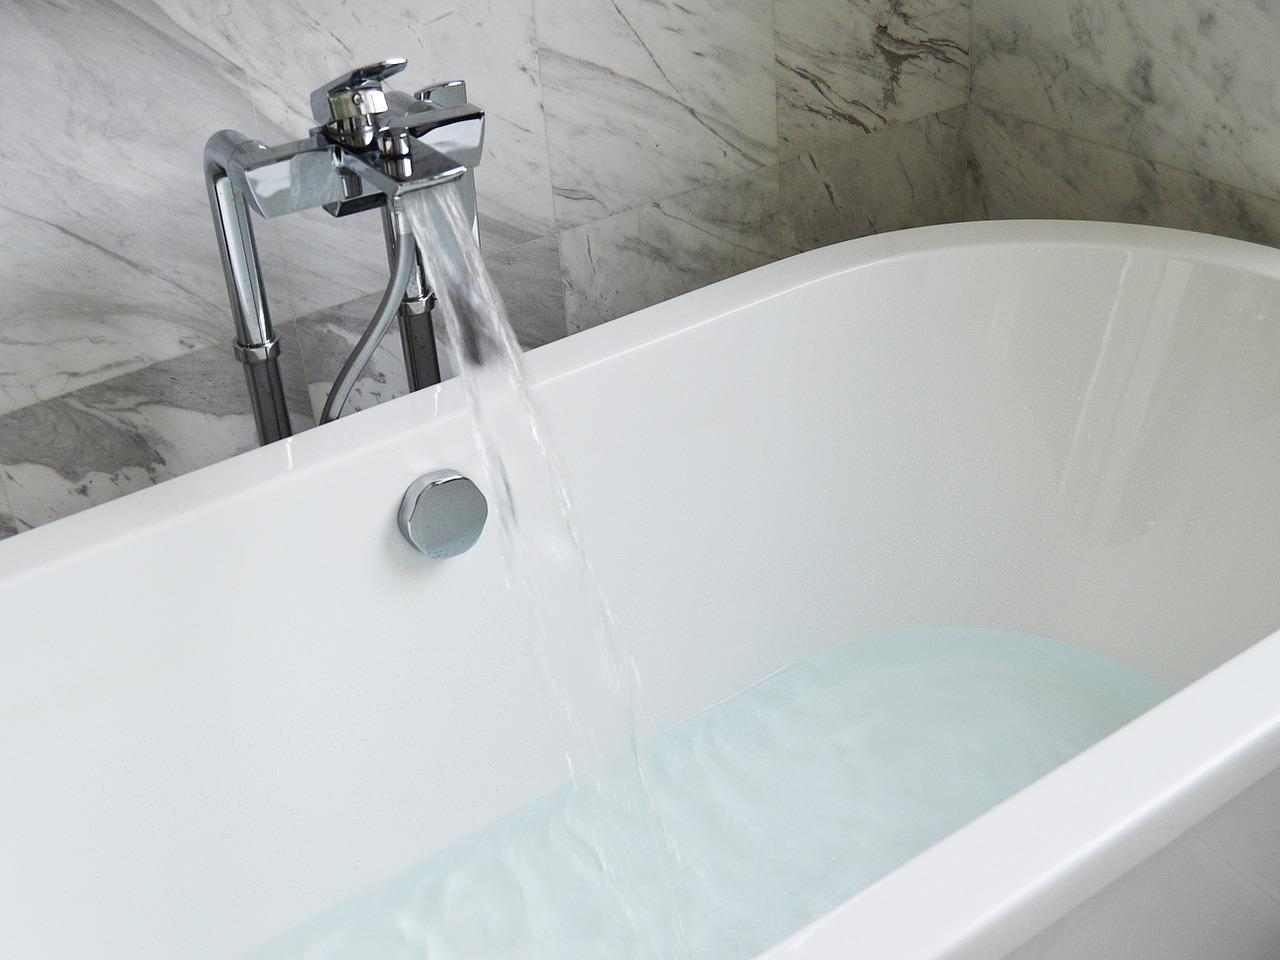 Vasca Da Bagno Misura Piccola : Vasca in acrilico nova